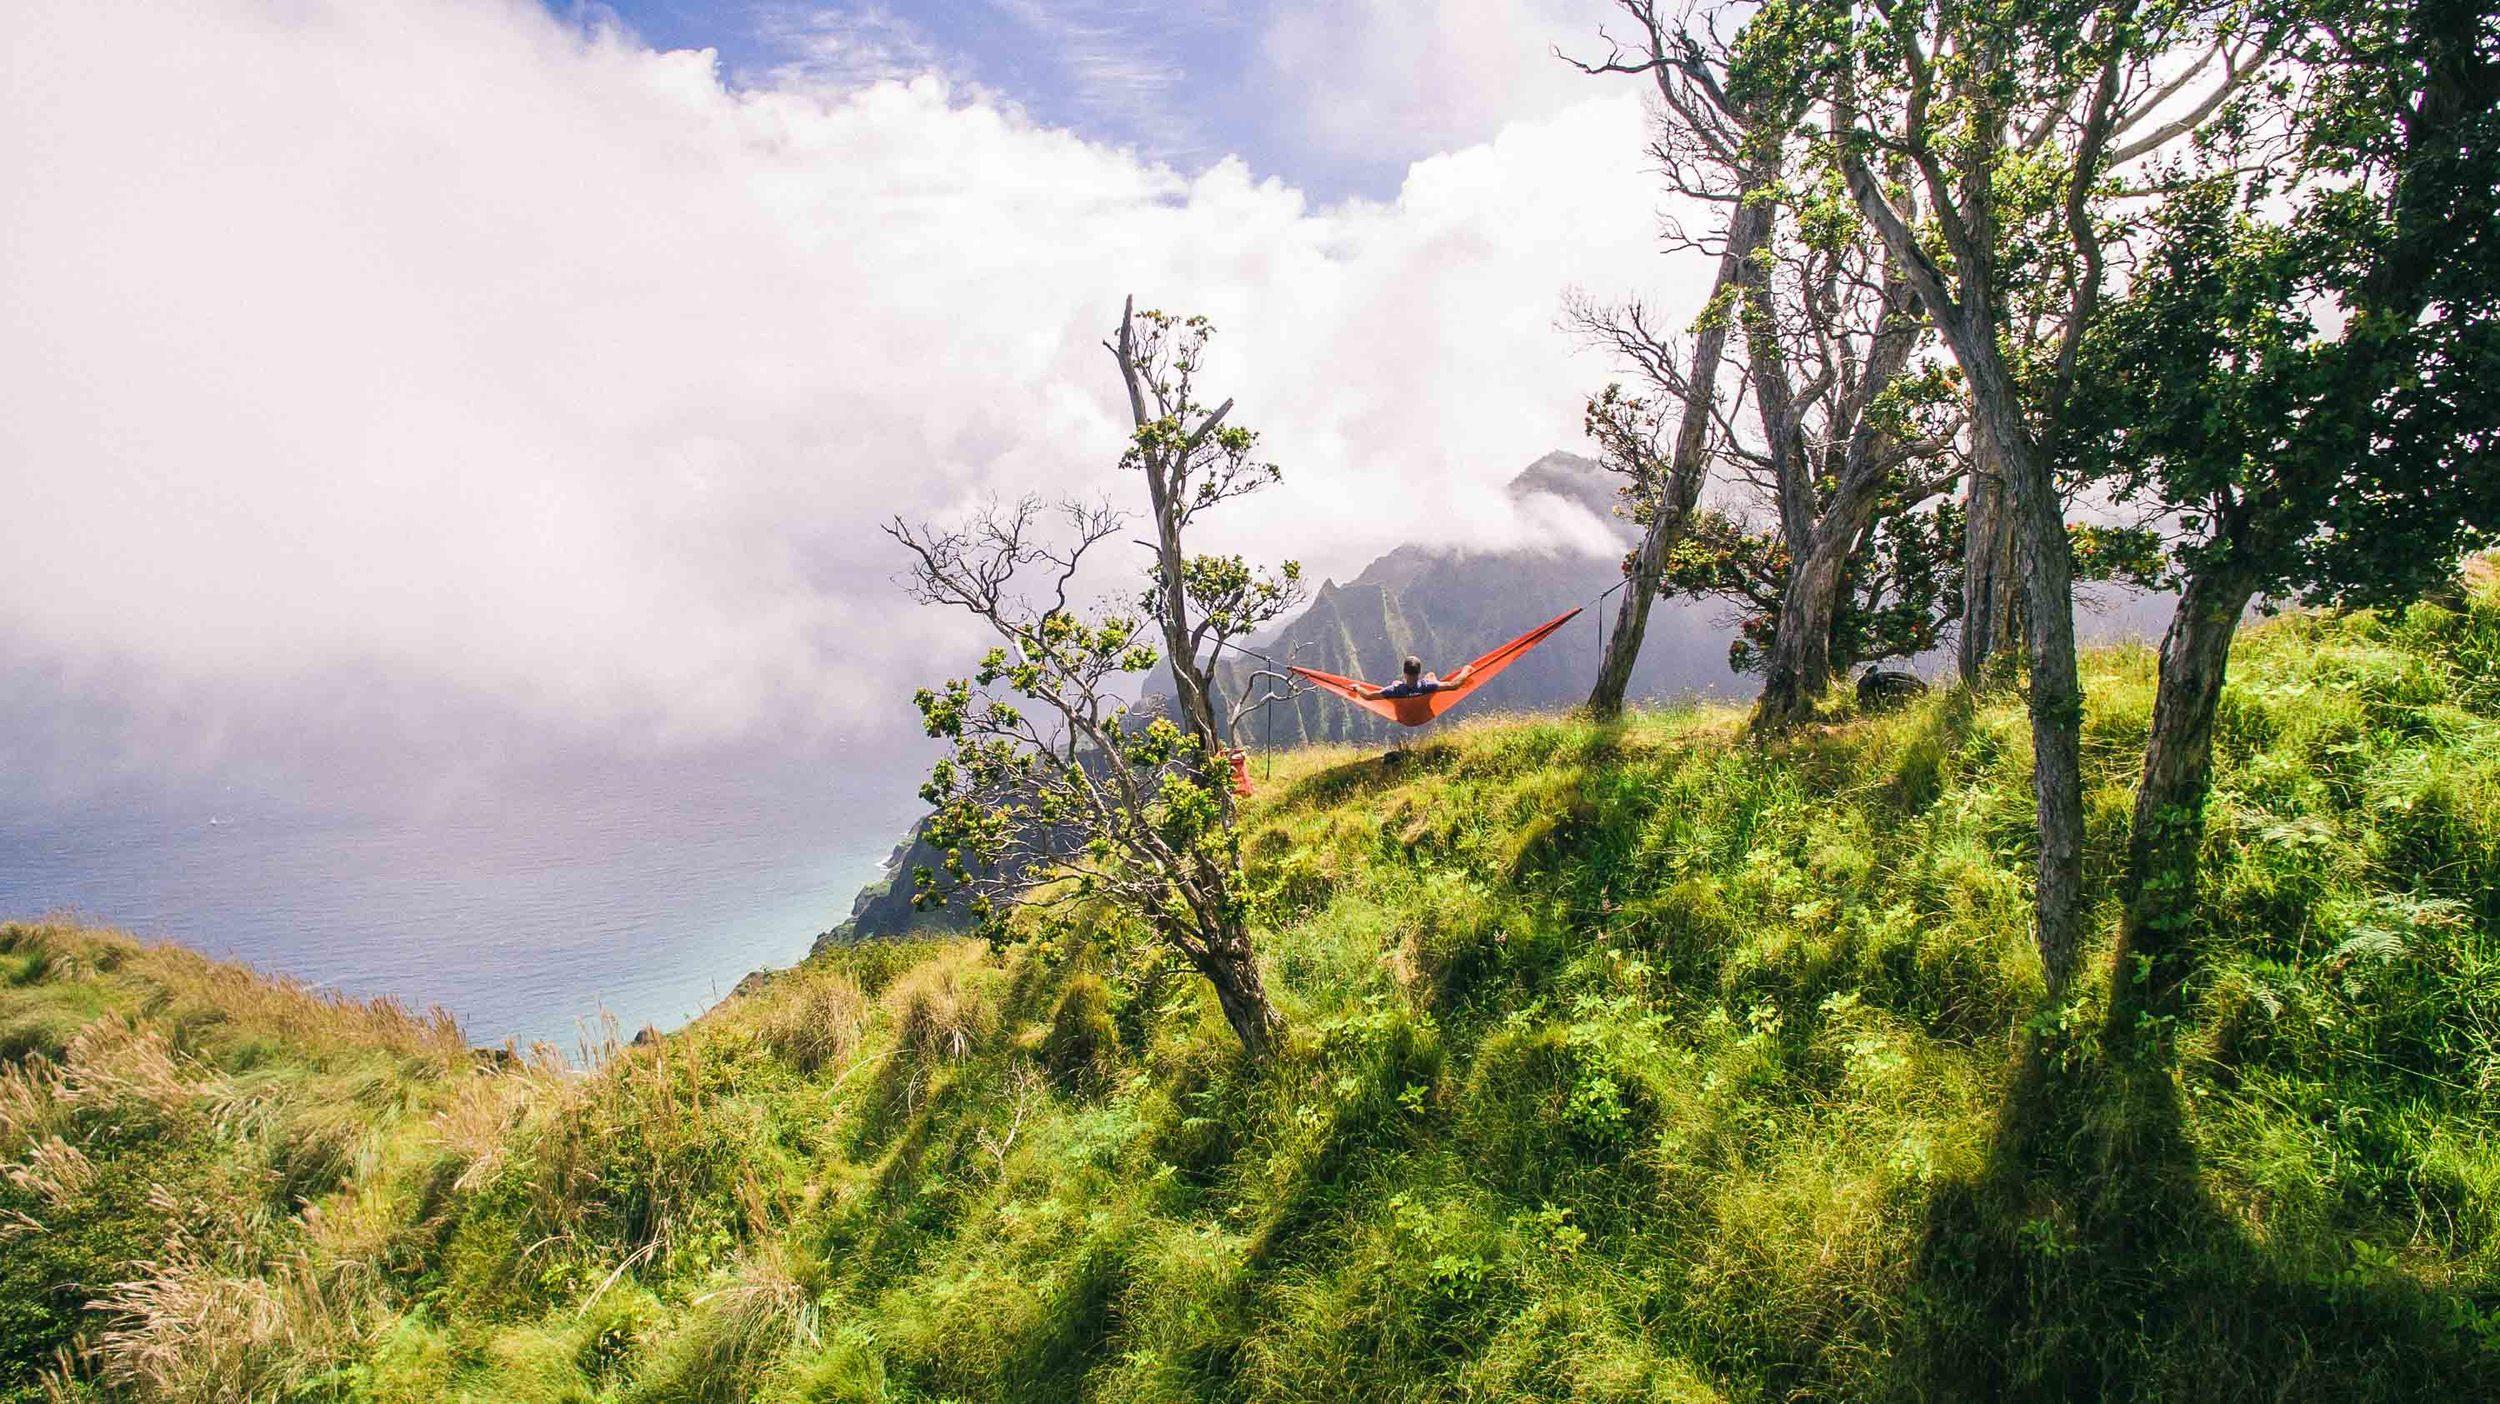 bryce-johnson-kalalau-ridge-kauai-hiking-hammock-palmwood-aloha-exchange-18.jpg